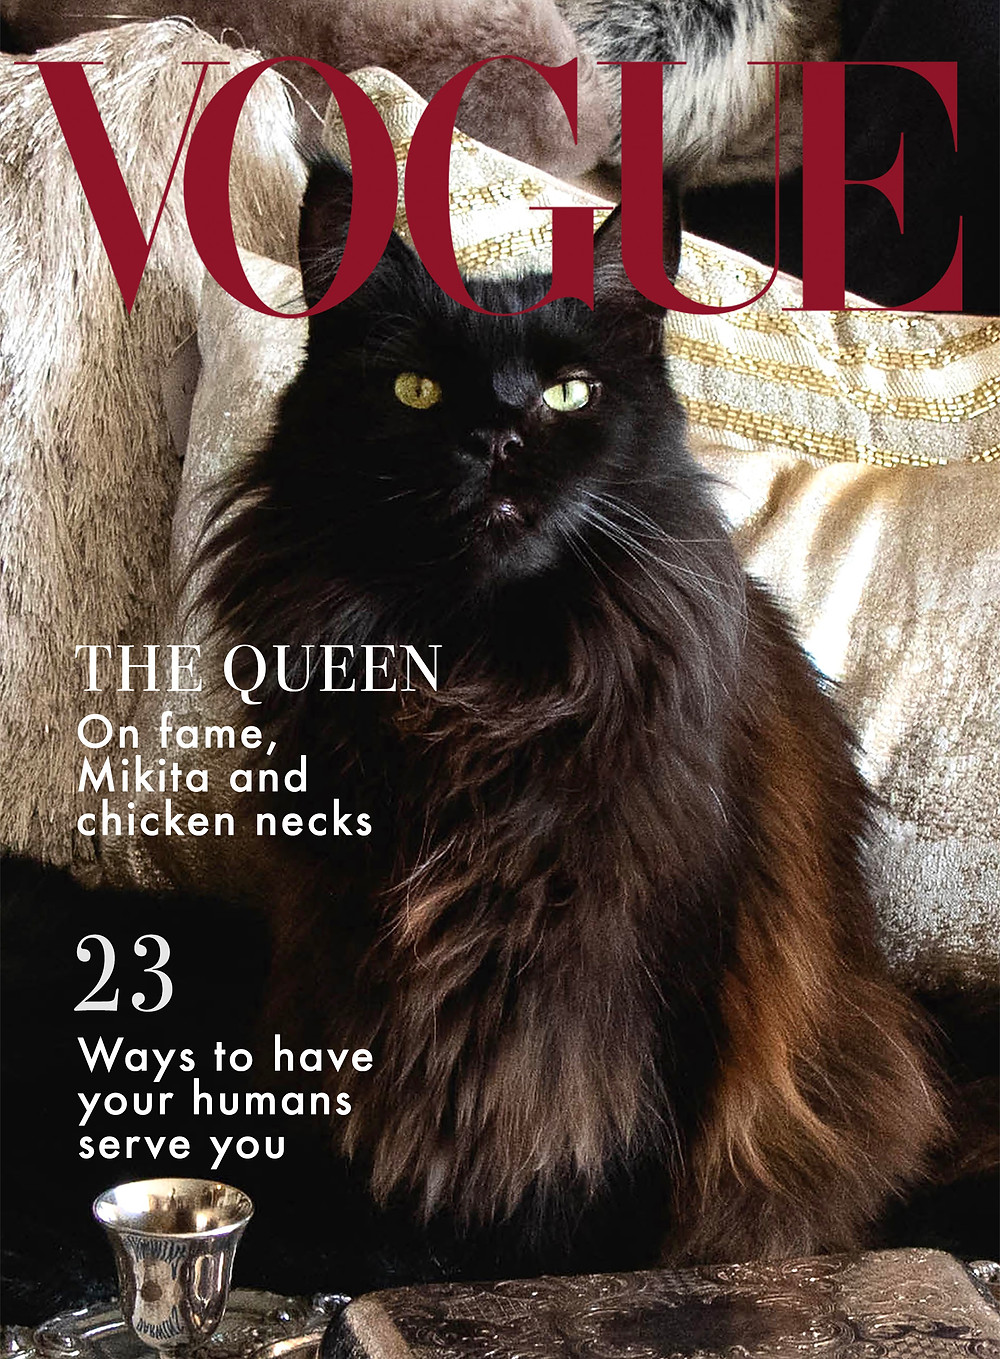 Dahlia's Vogue cover 3 from Chicago Black Cat